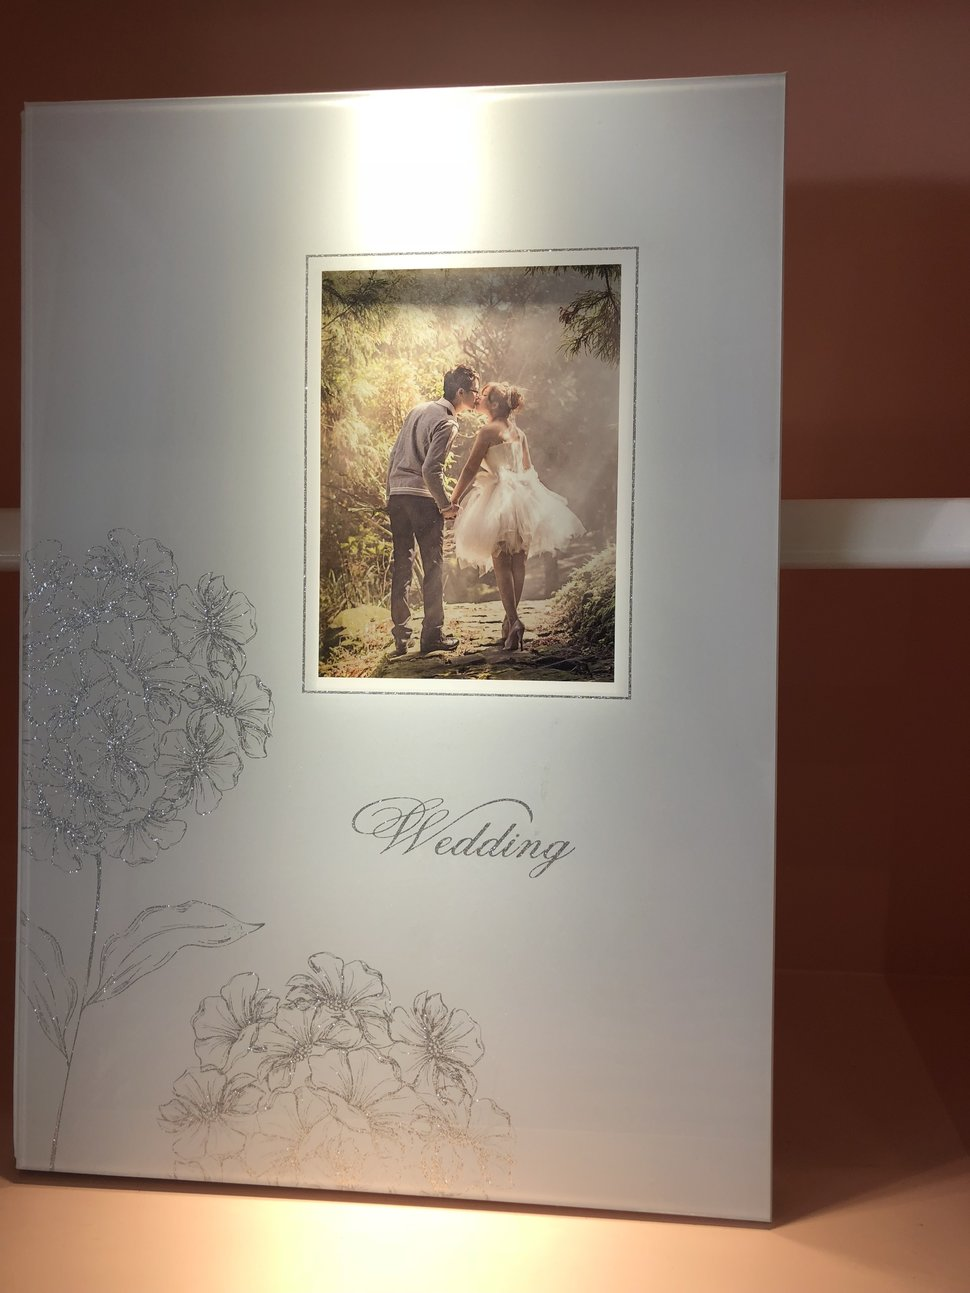 IMG_3632 - 全台最便宜-45DESIGN四五婚紗禮服《結婚吧》